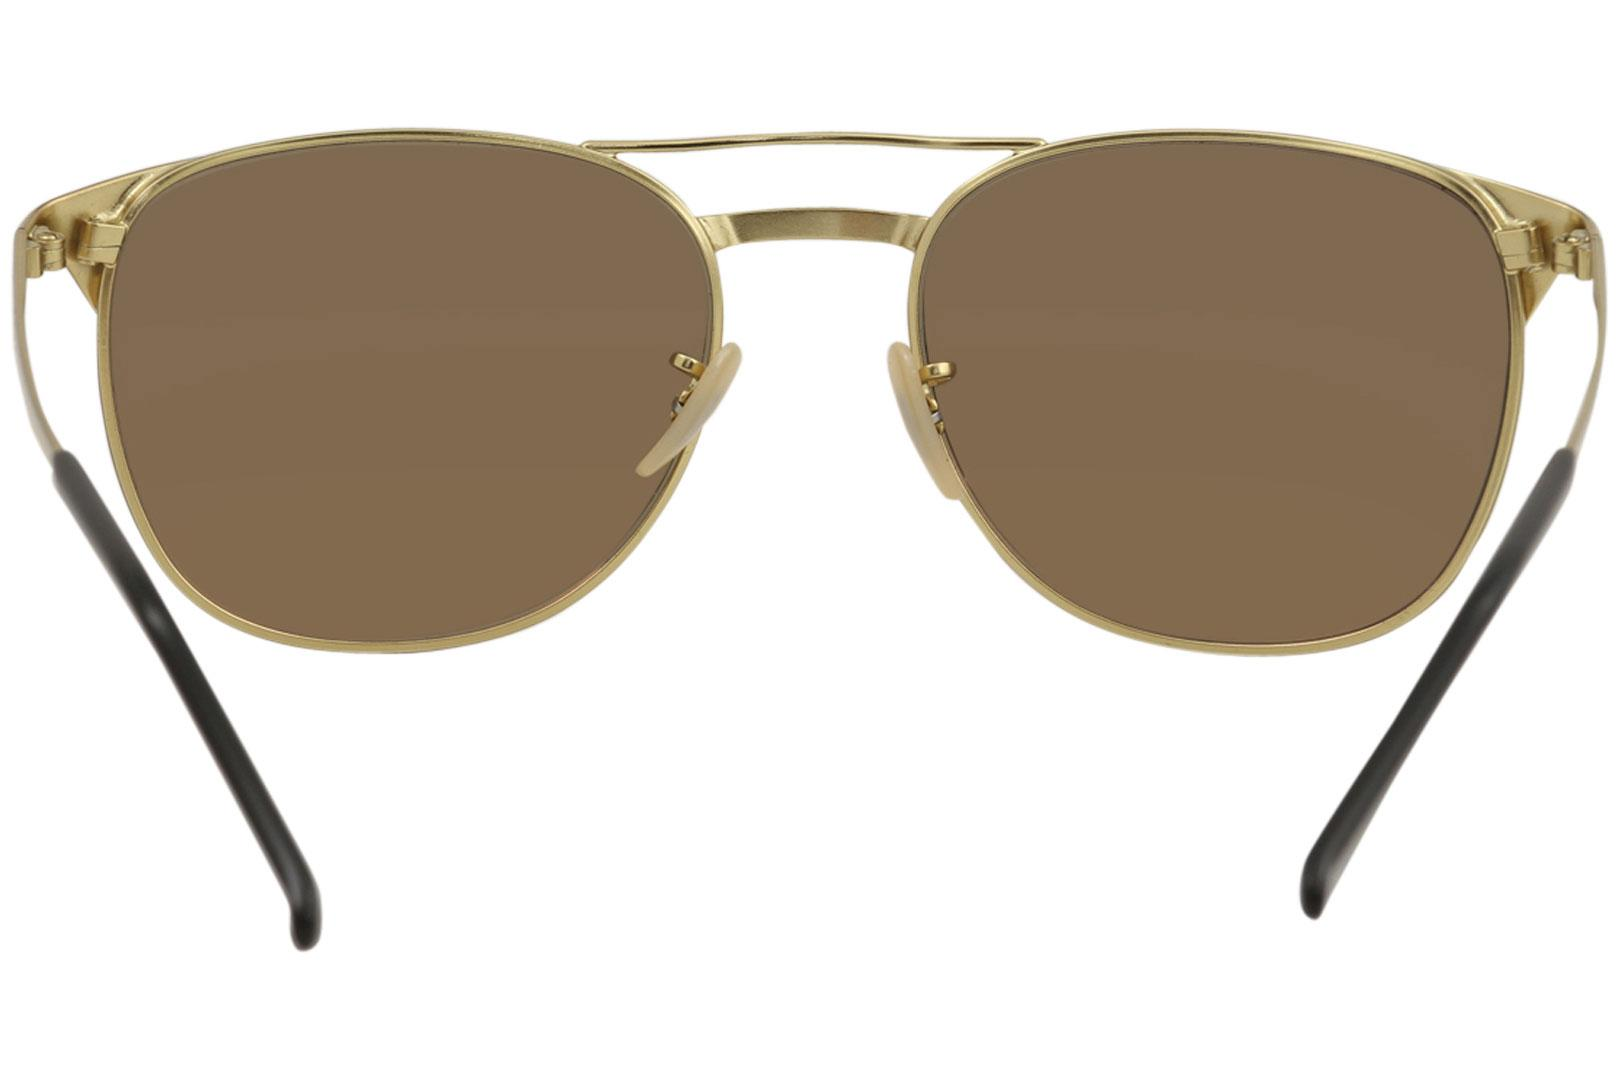 4f922e1acfb52 Ray Ban Men s Signet RB3429M RB 3429 M RayBan Fashion Pilot Sunglasses by Ray  Ban